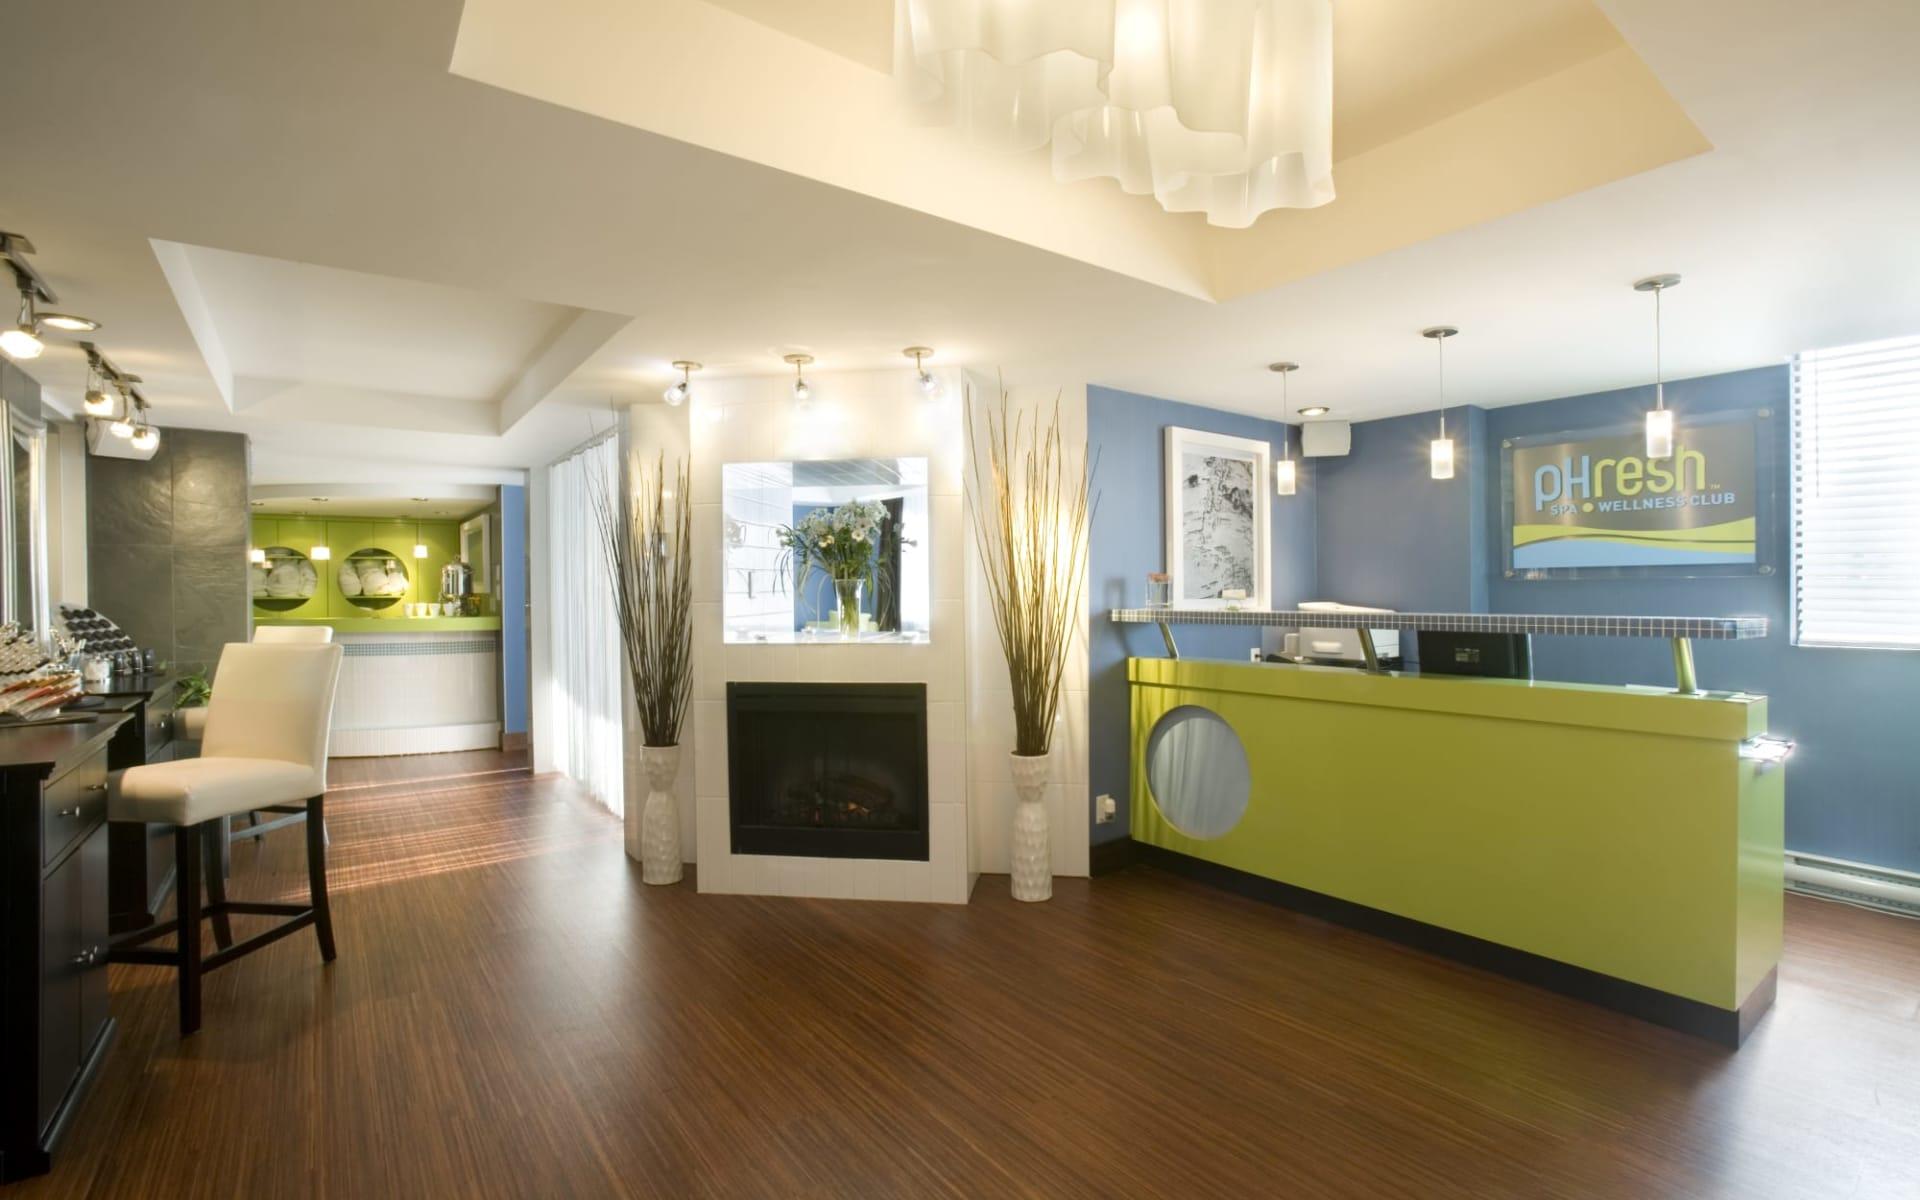 Sandman Suites on Davie in Vancouver: facilities_Sandman Suites on Davie_Spa